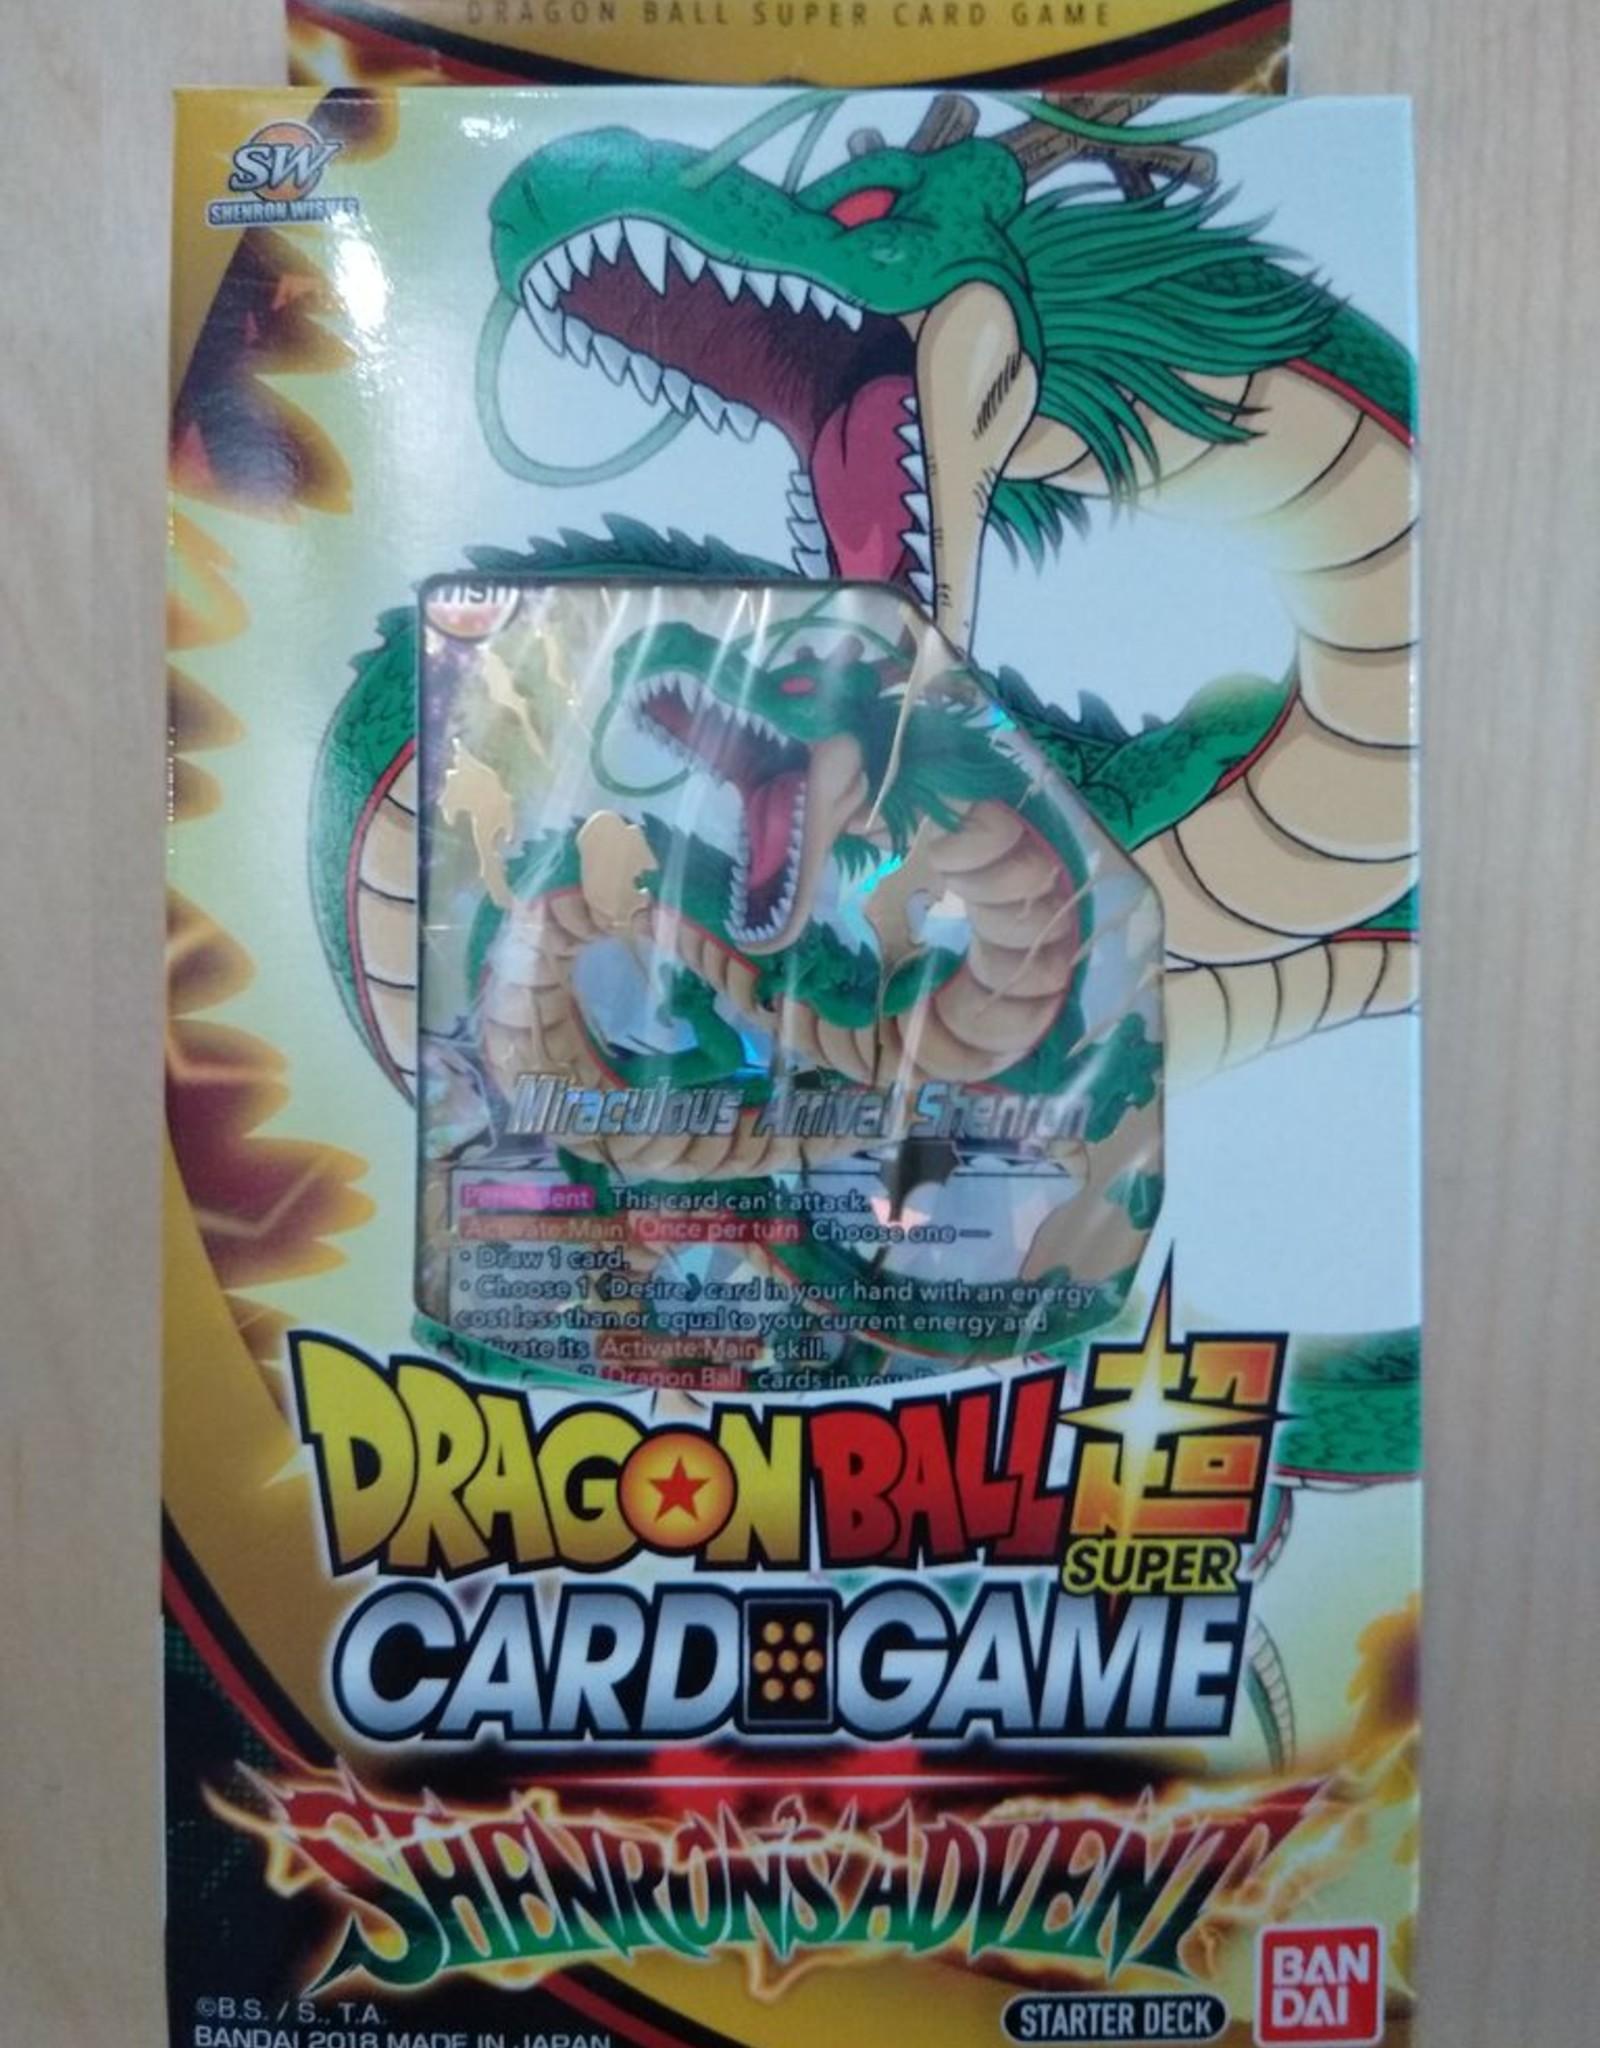 DBS - Dragon Ball Super DragonBall Super Card Game - Starter Deck 7, Shenron's Advent - EN